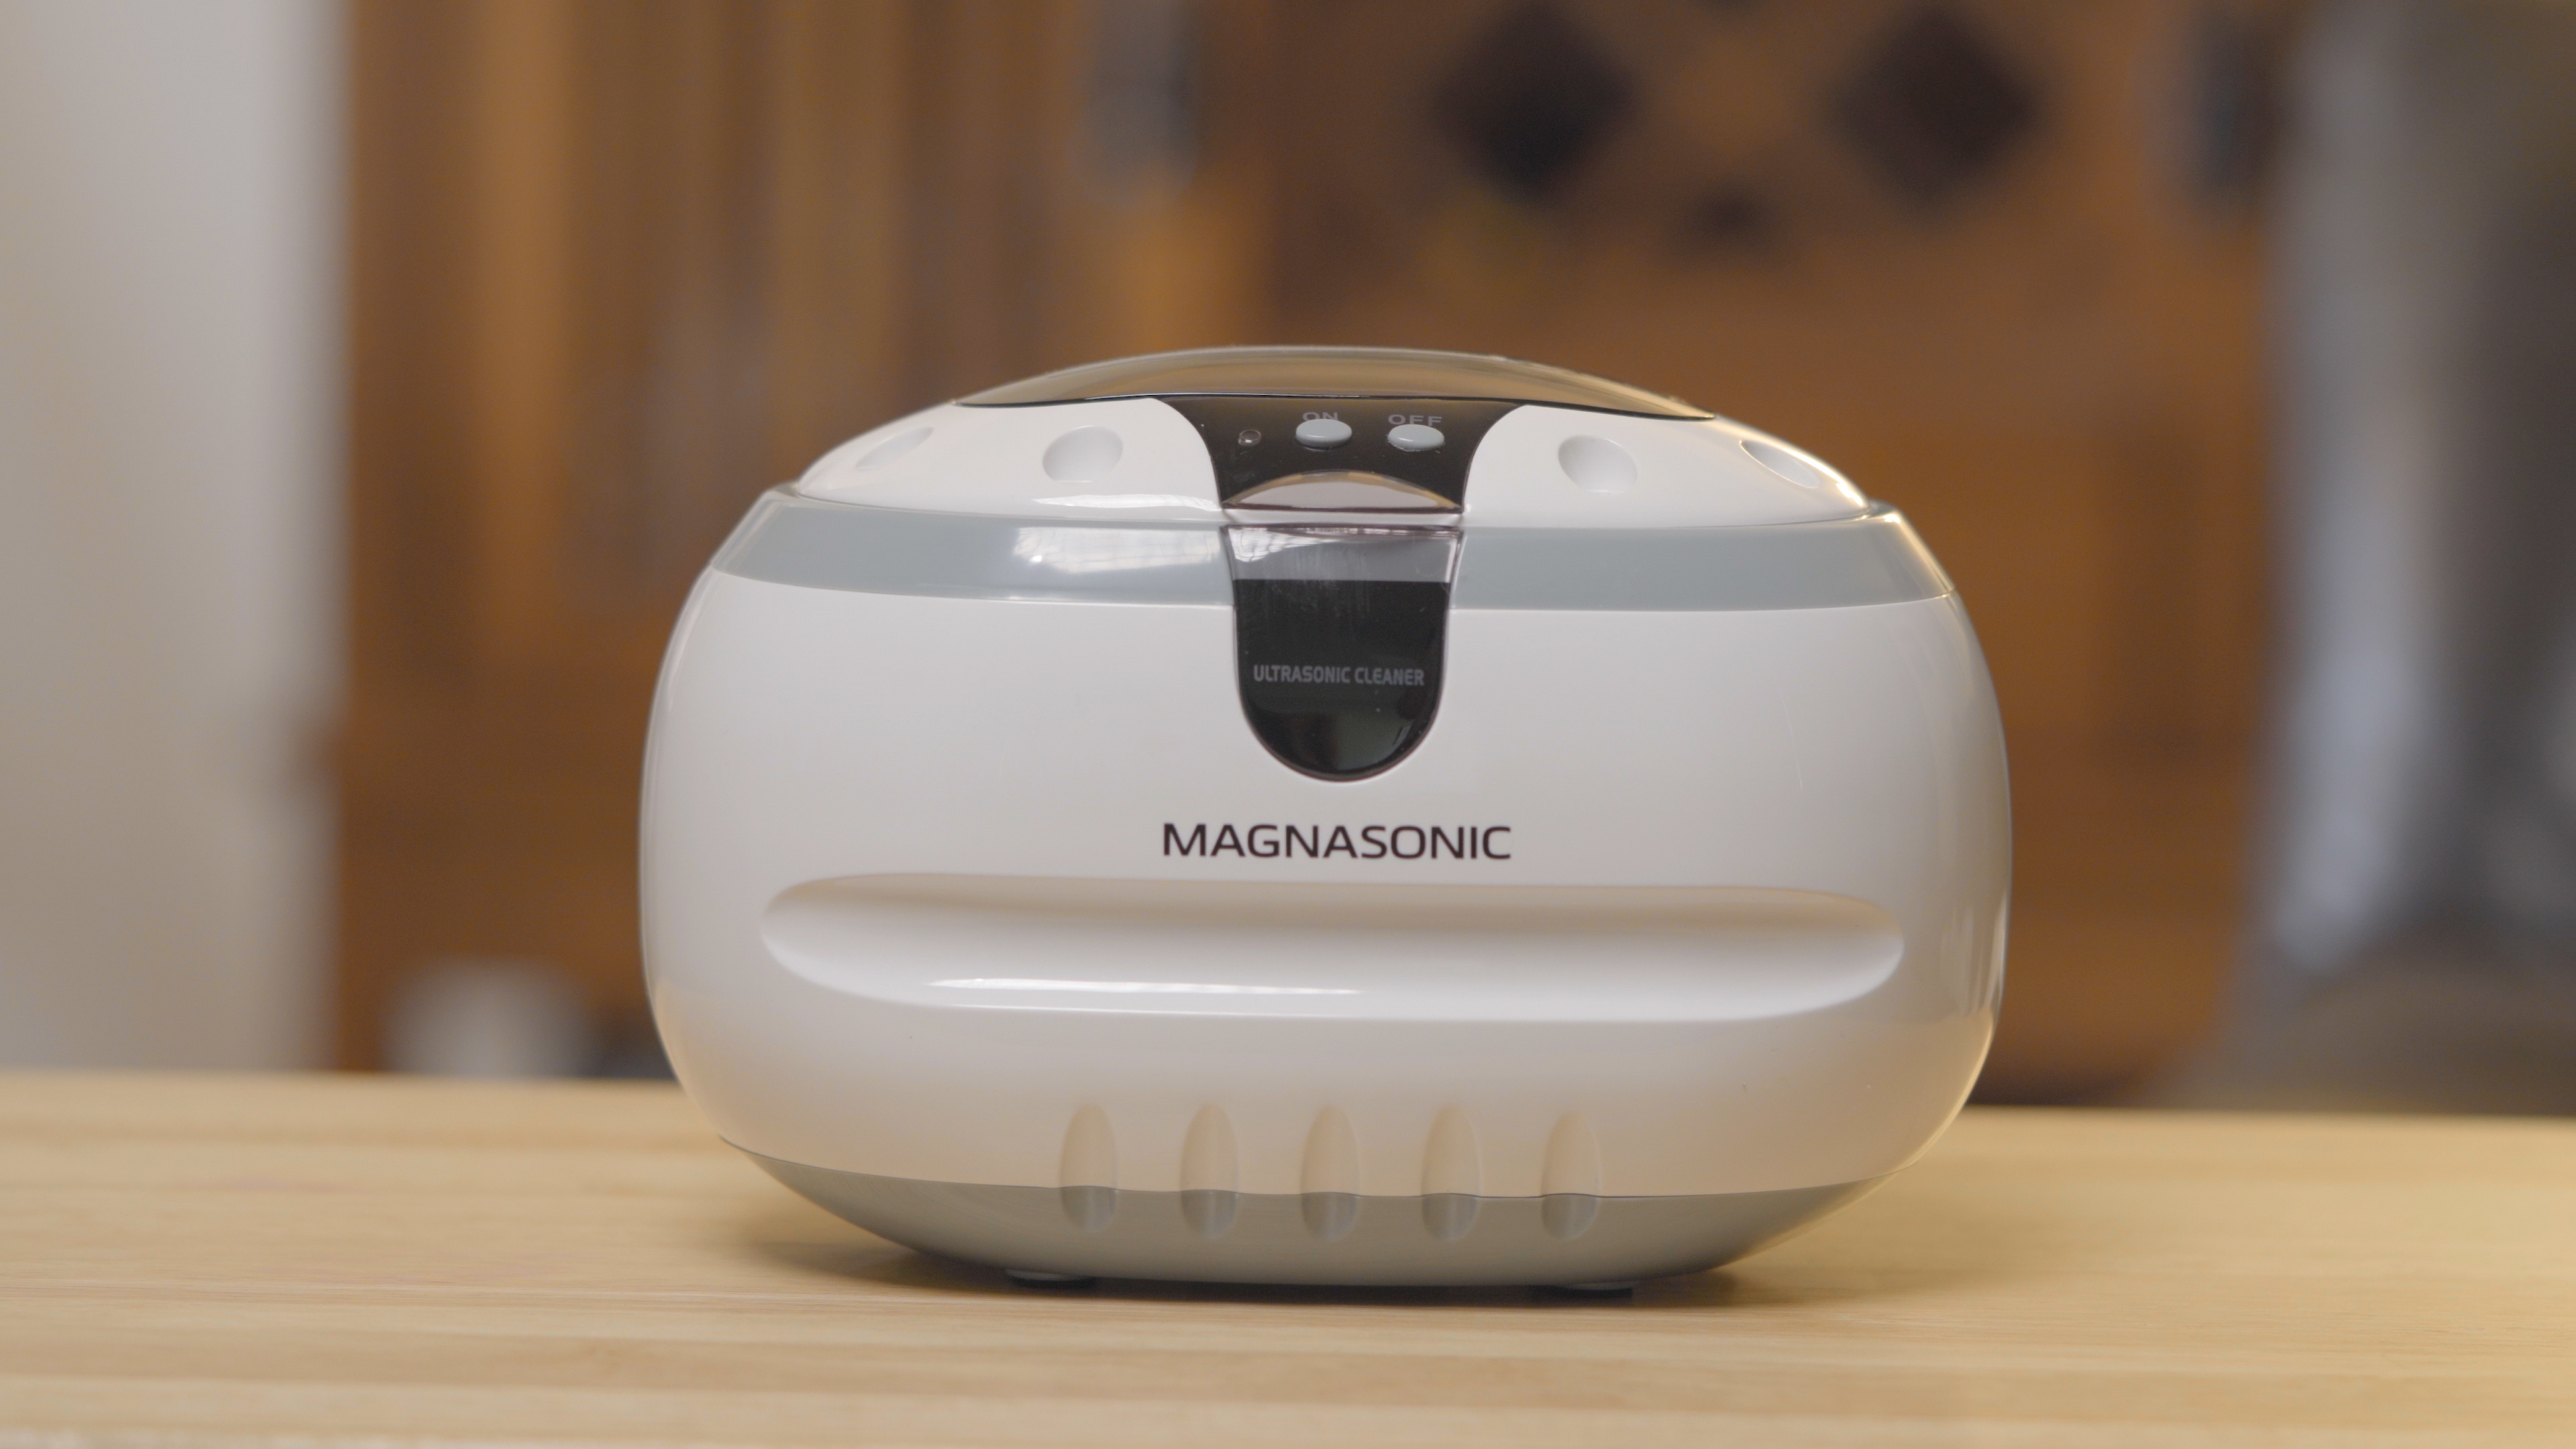 Magnasonic CD2800 Ultrasonic Jewelry Cleaner